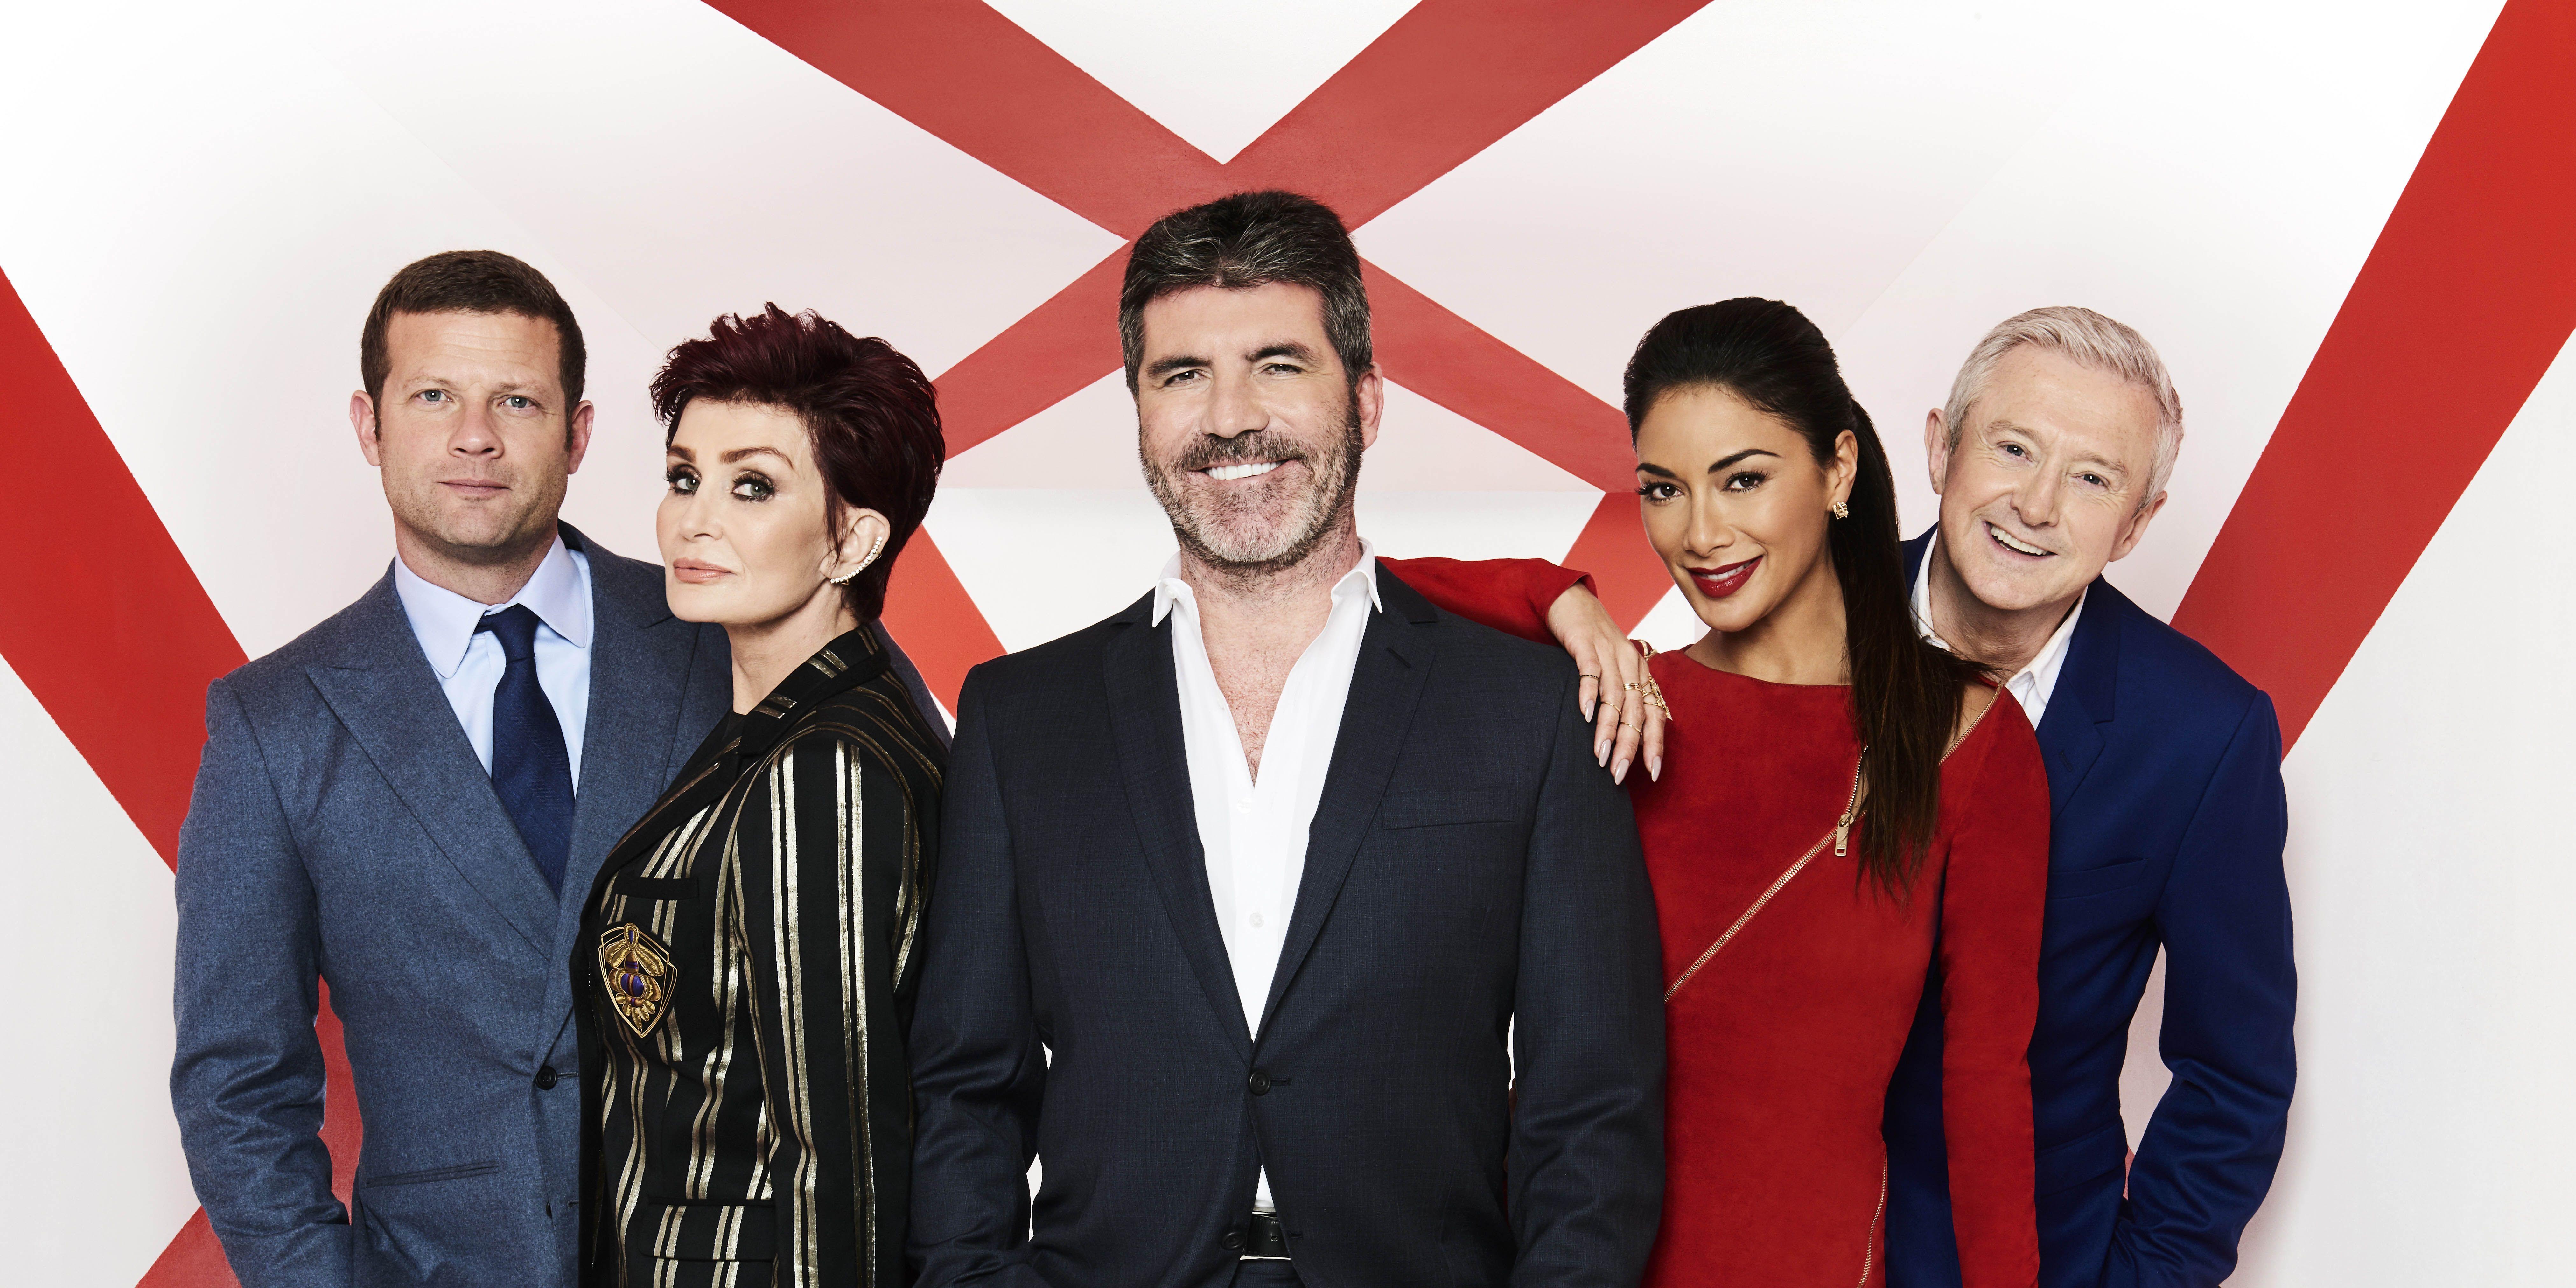 Dermot O'Leary, Sharon Osbourne, Simon Cowell, Nicole Scherzinger, Louis Walsh, X Factor, 2016